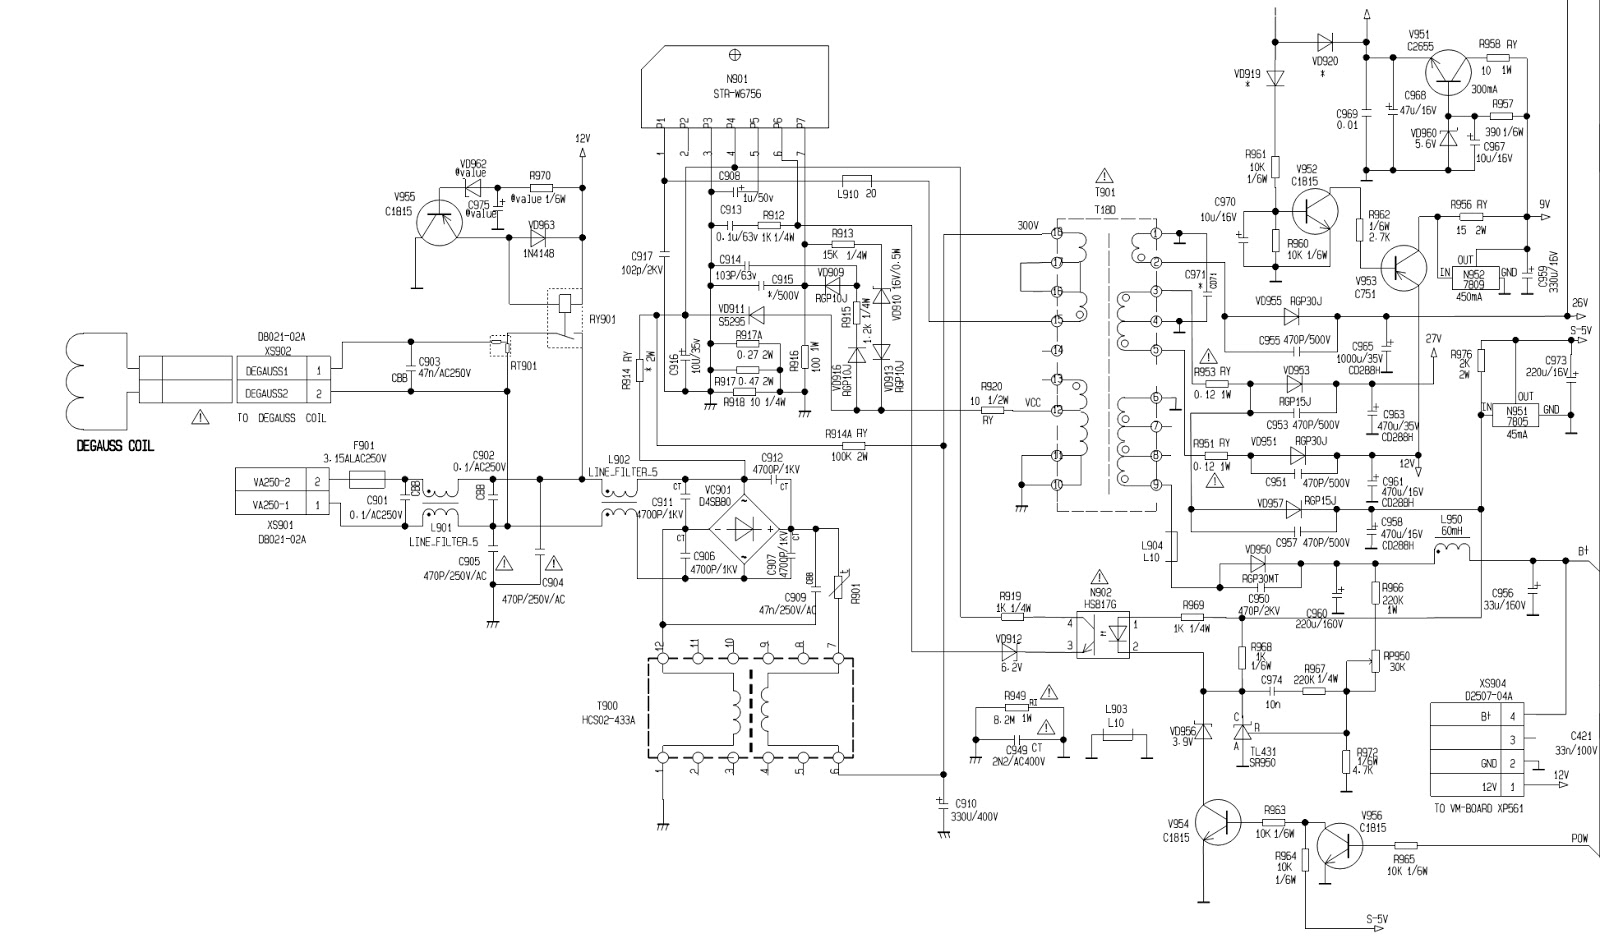 toshiba air conditioner wiring diagram wiring diagram main pc board mcc713 toshiba ras10sax user [ 1600 x 952 Pixel ]